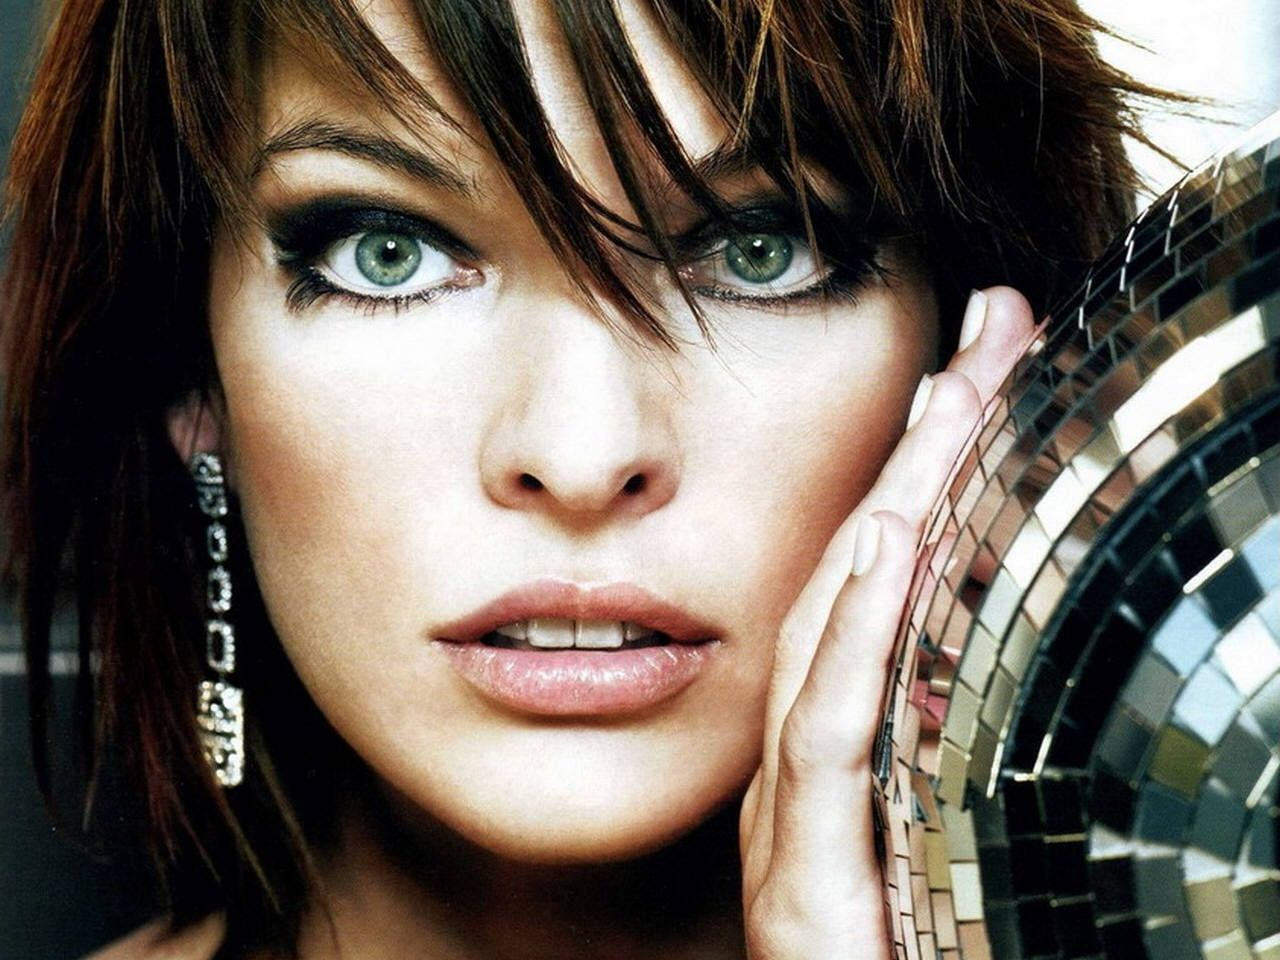 Milla Jovovich eyes pics